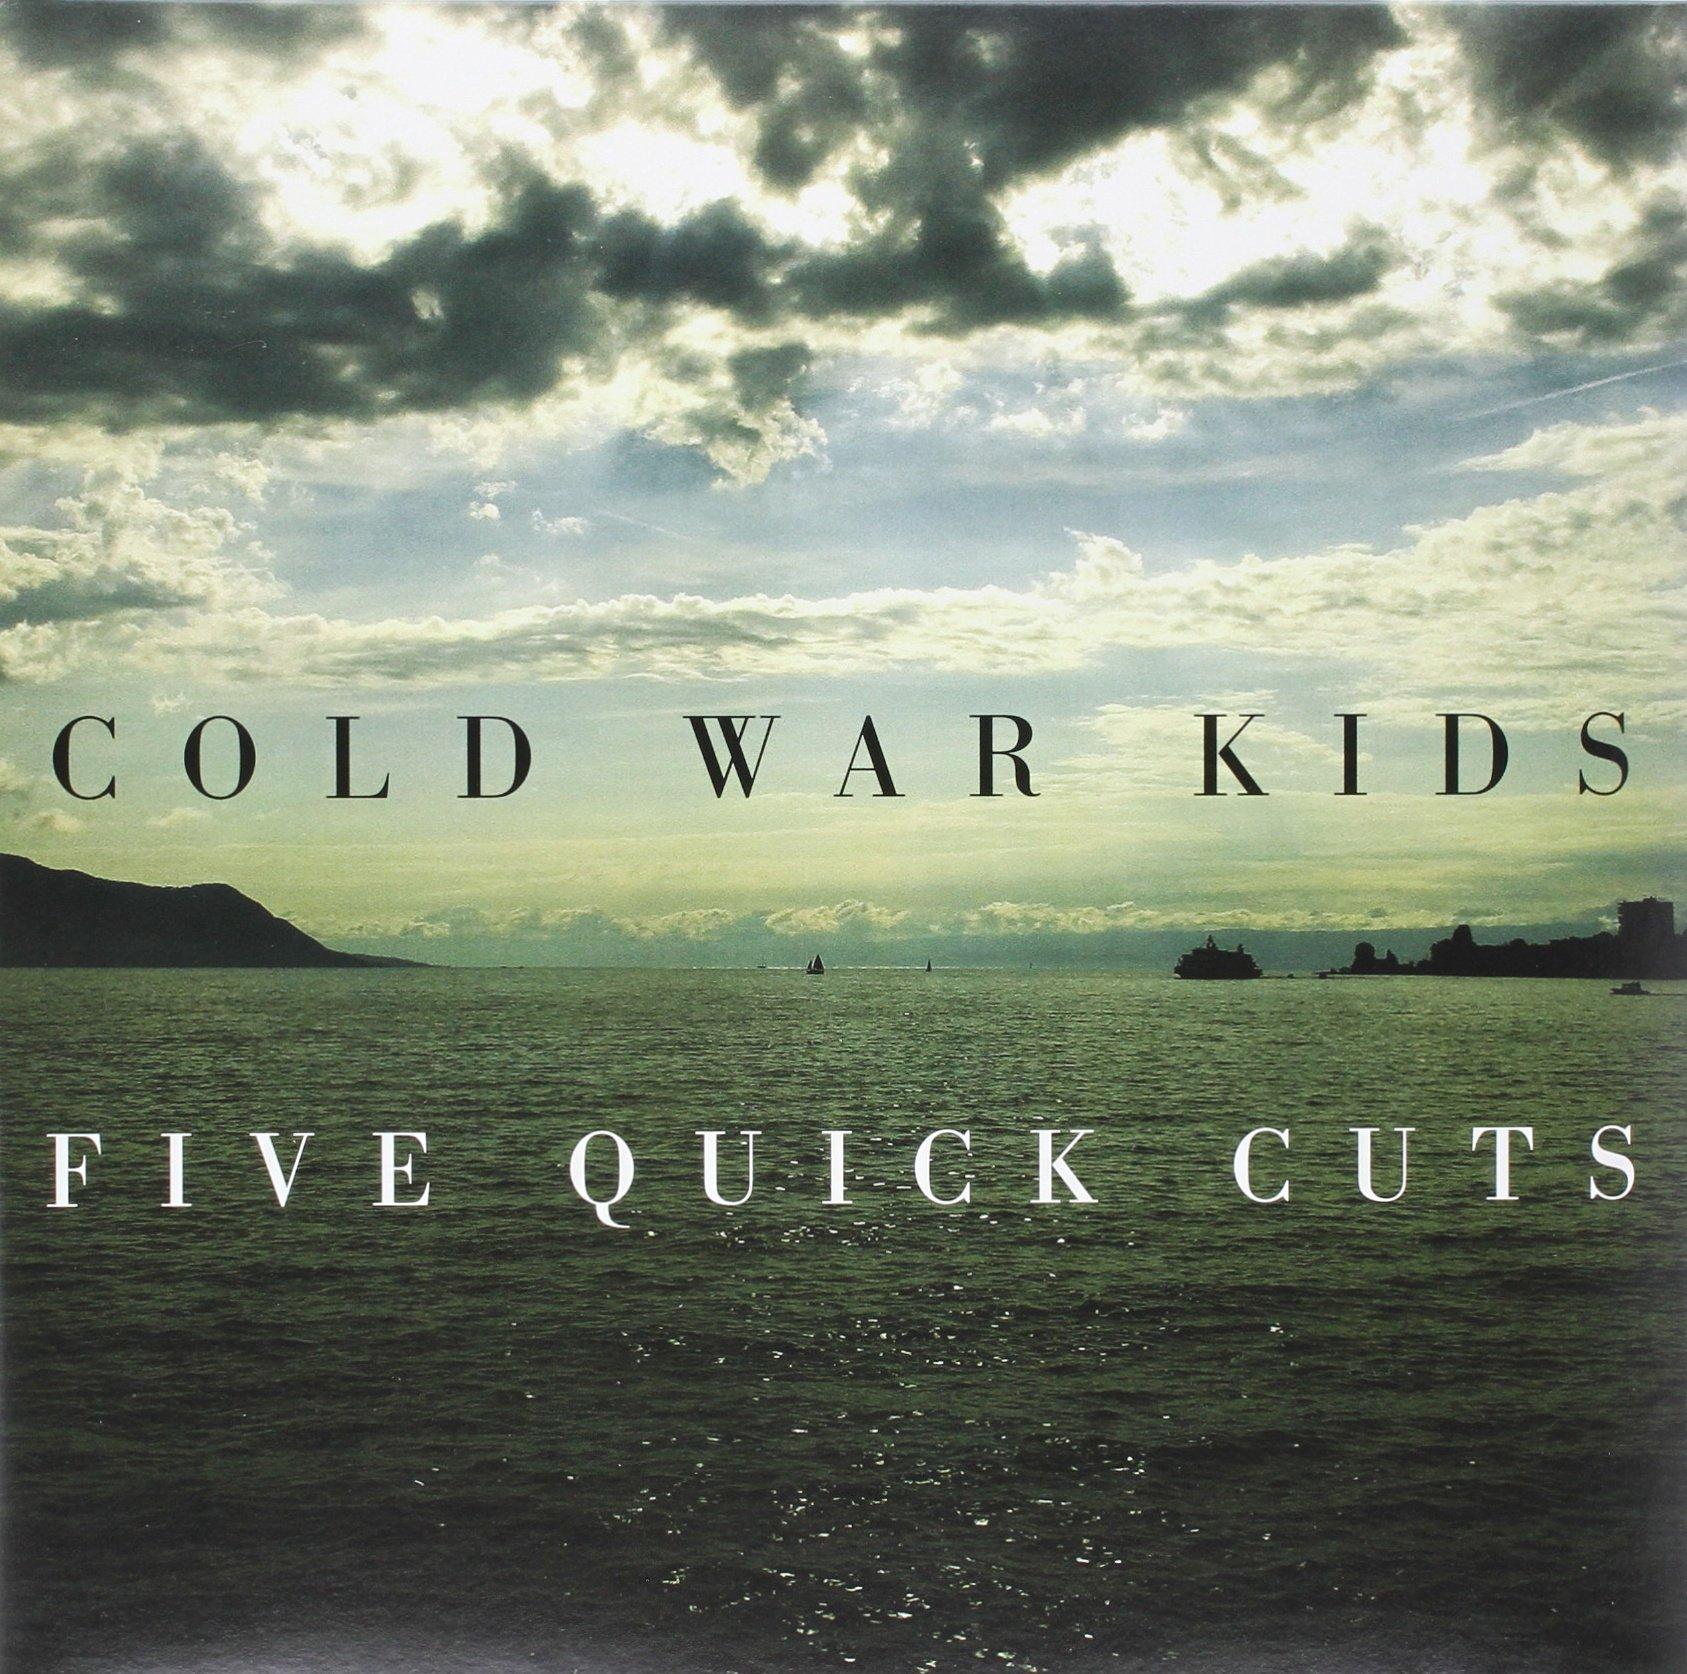 Cold War Kids - Five Quick Cuts - Album Cover